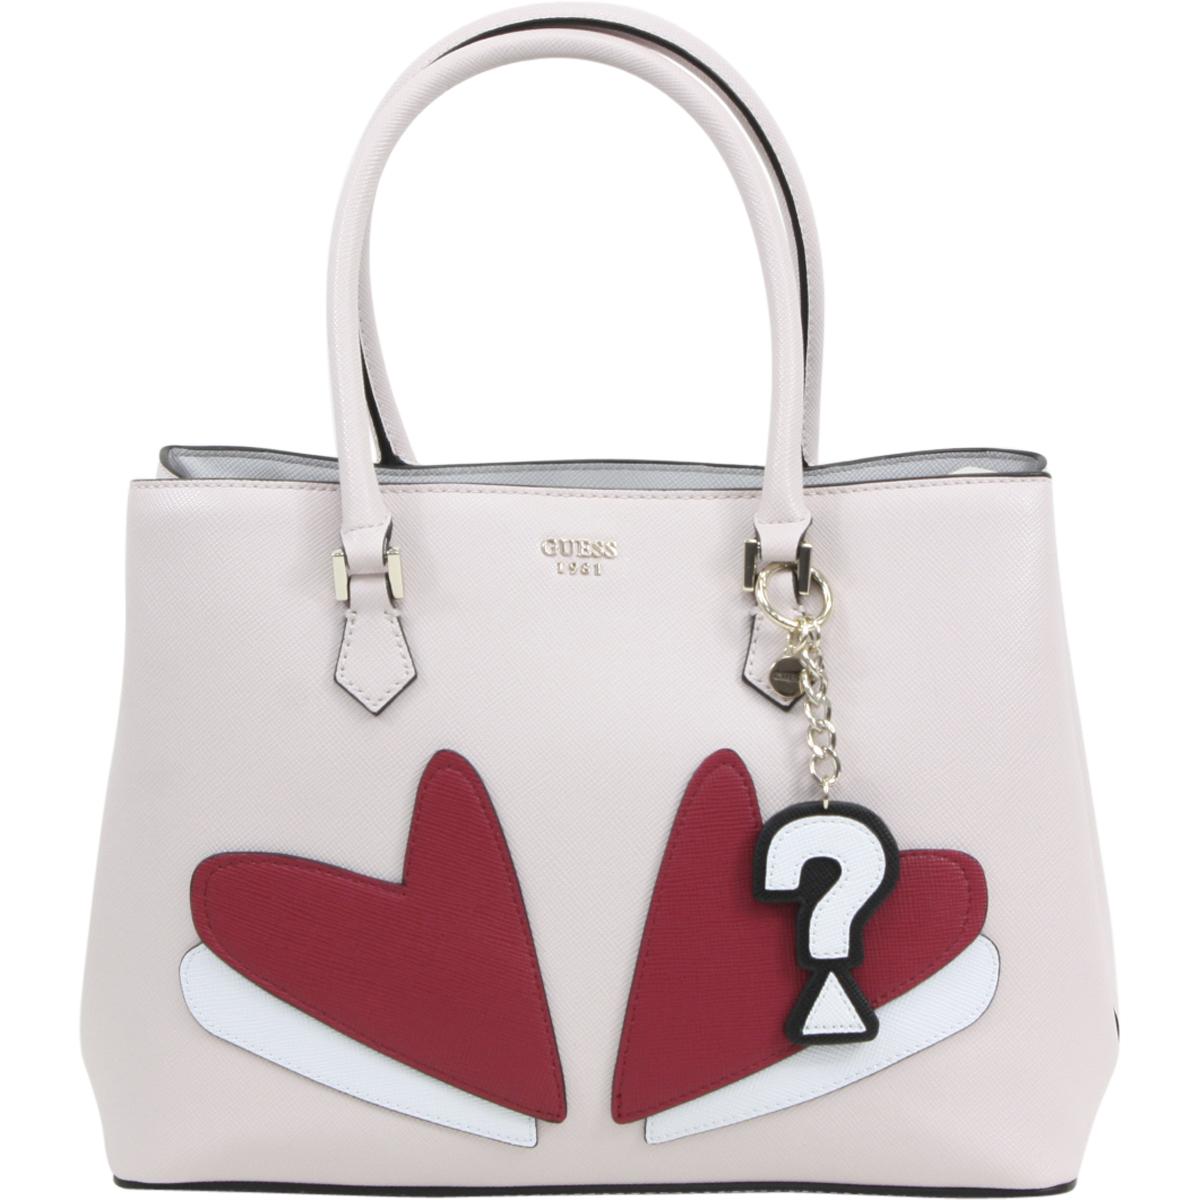 Details about Guess Women's Pin Up Pop Pebbled Shopper Tote Handbag